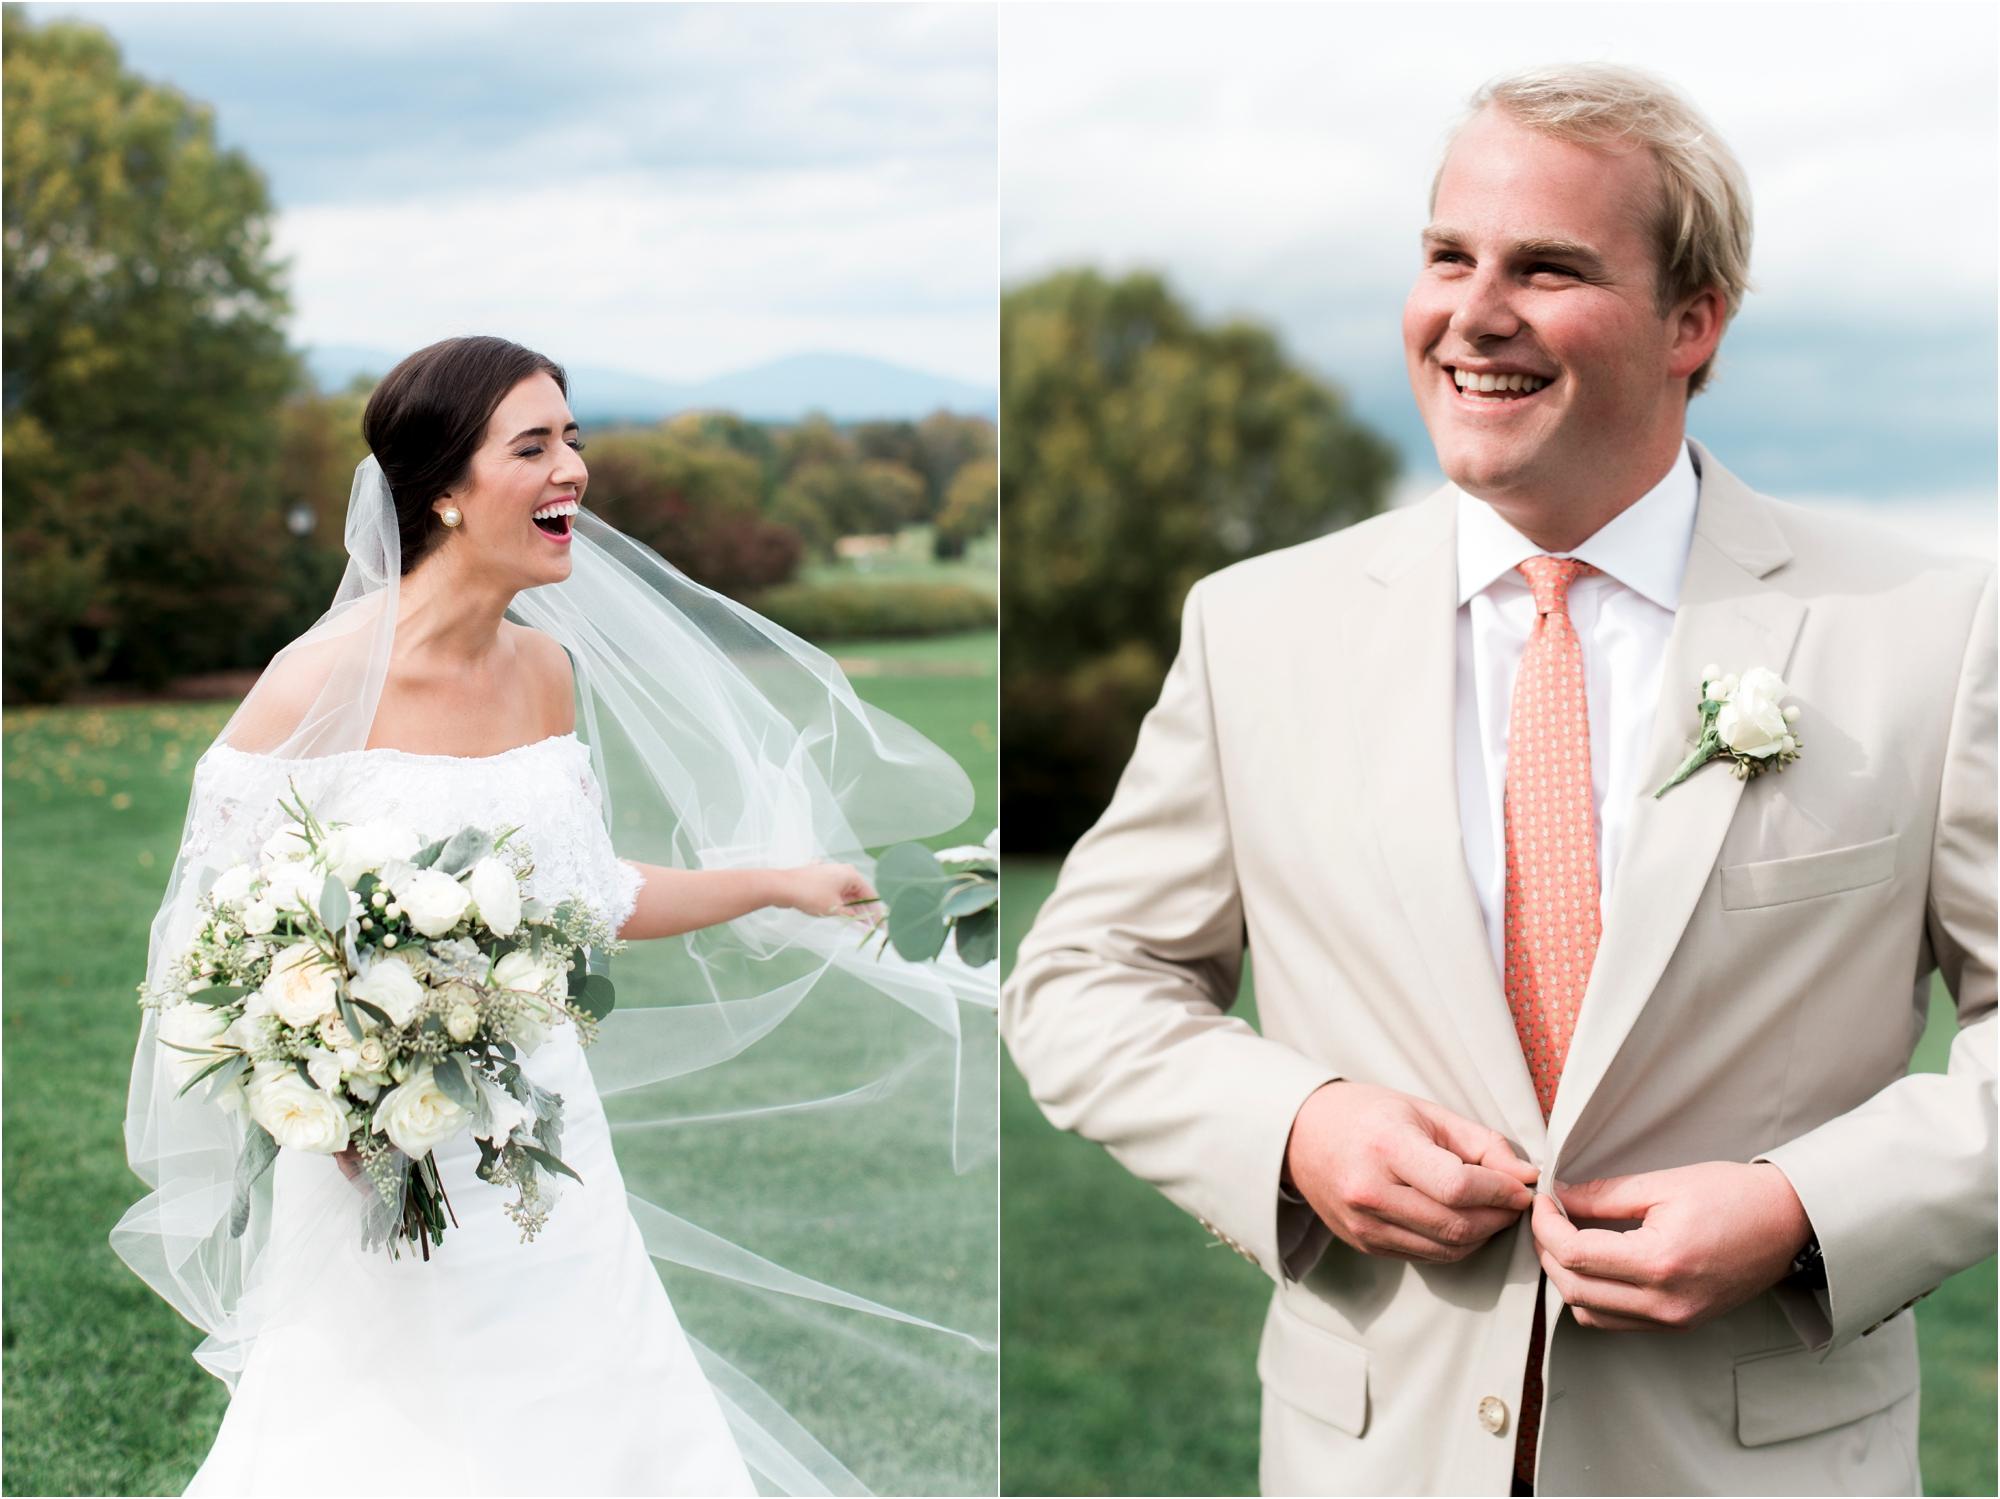 claire-thomas-farmington-country-club-charlottesville-virginia-wedding-photos_0017.jpg